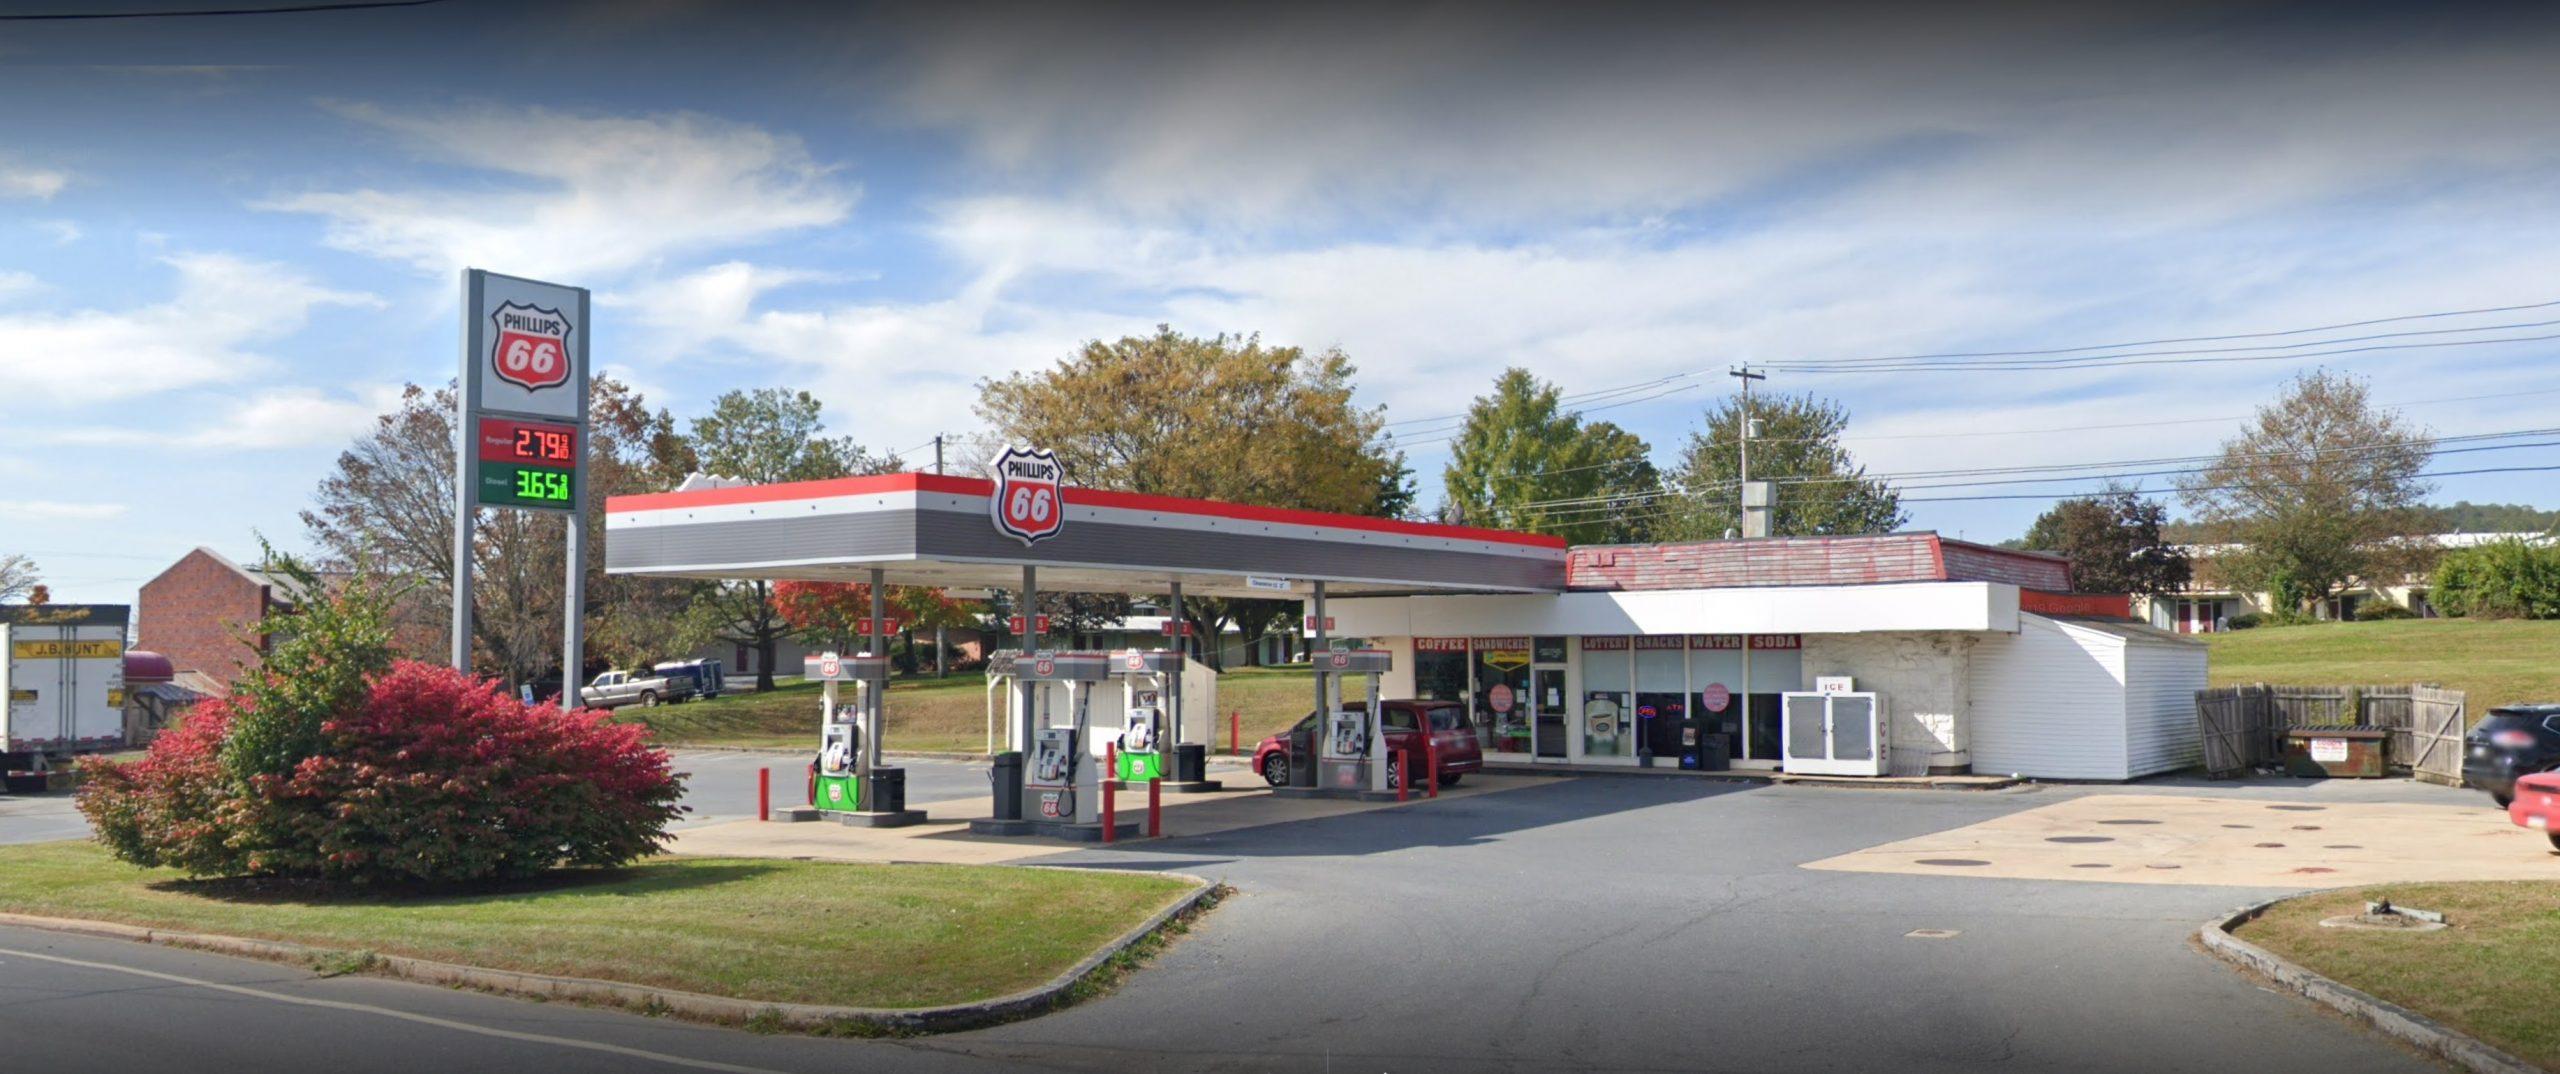 Bitcoin ATM Denver PA 2194 North Reading Road Denver Hippo Kiosks atm